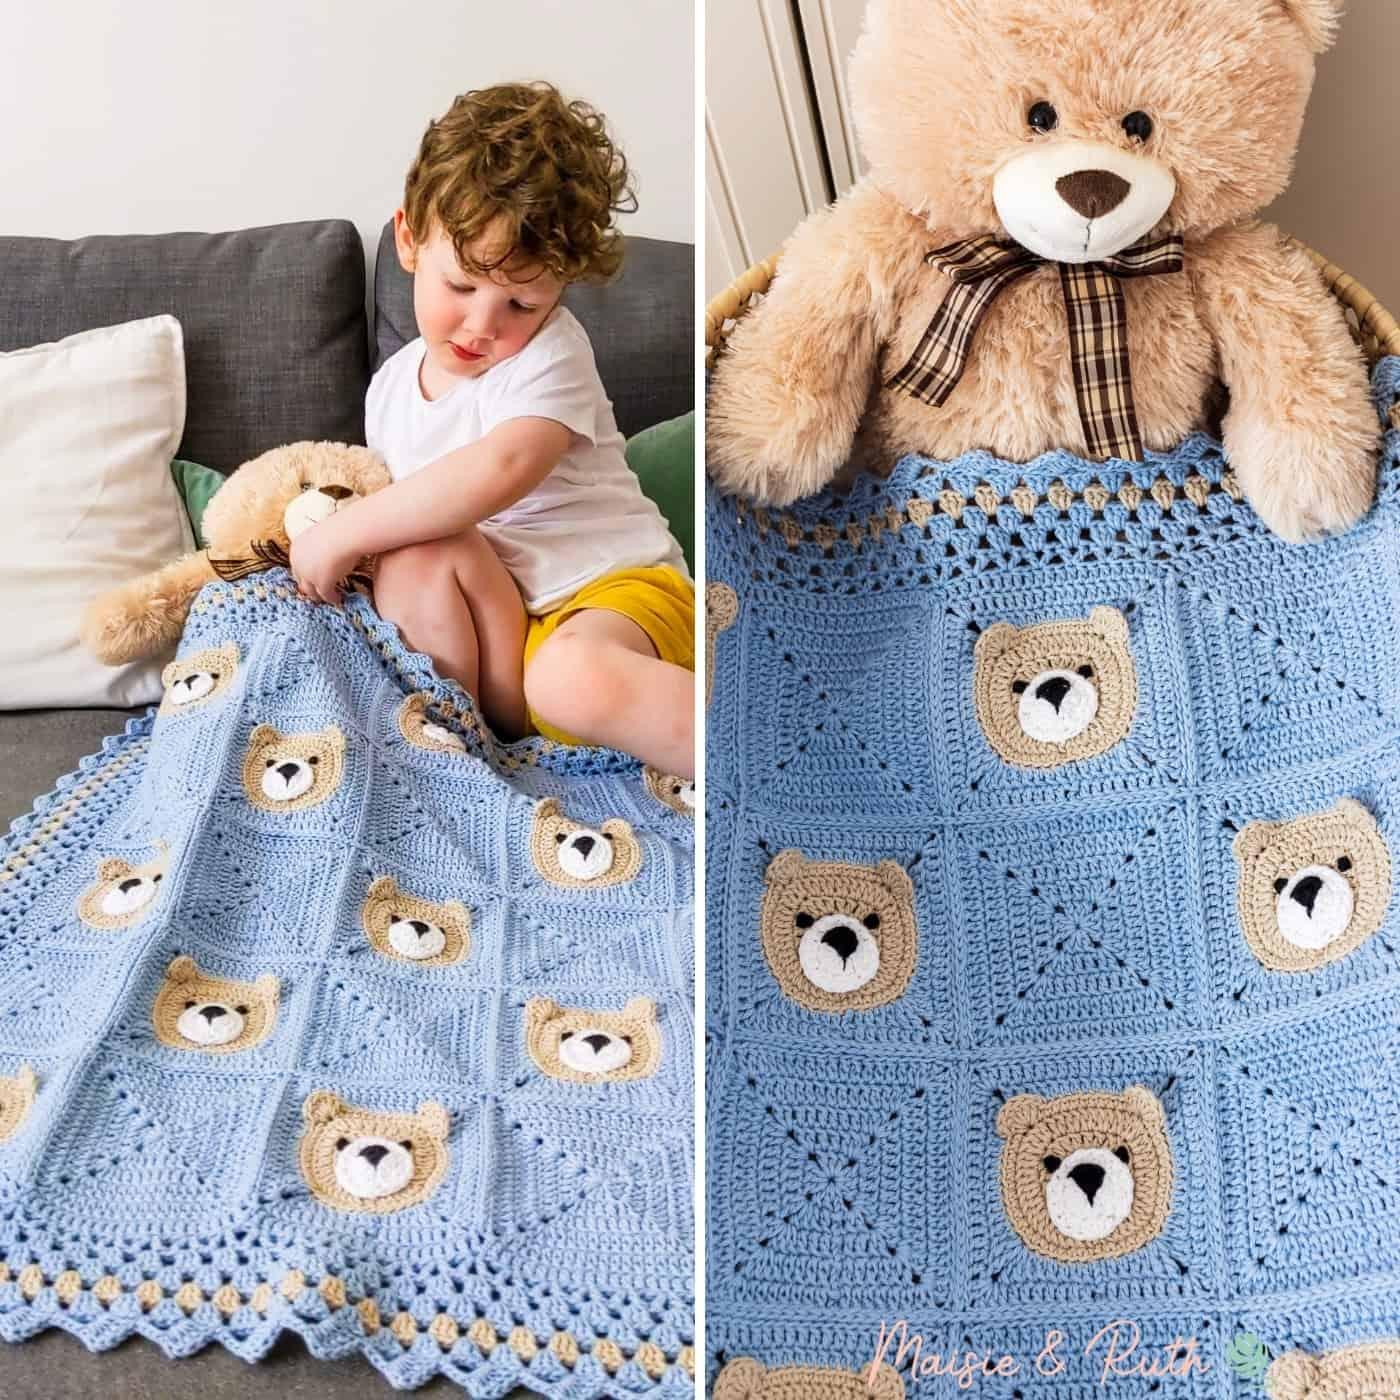 Bear Crochet Baby Blanket with Toddler